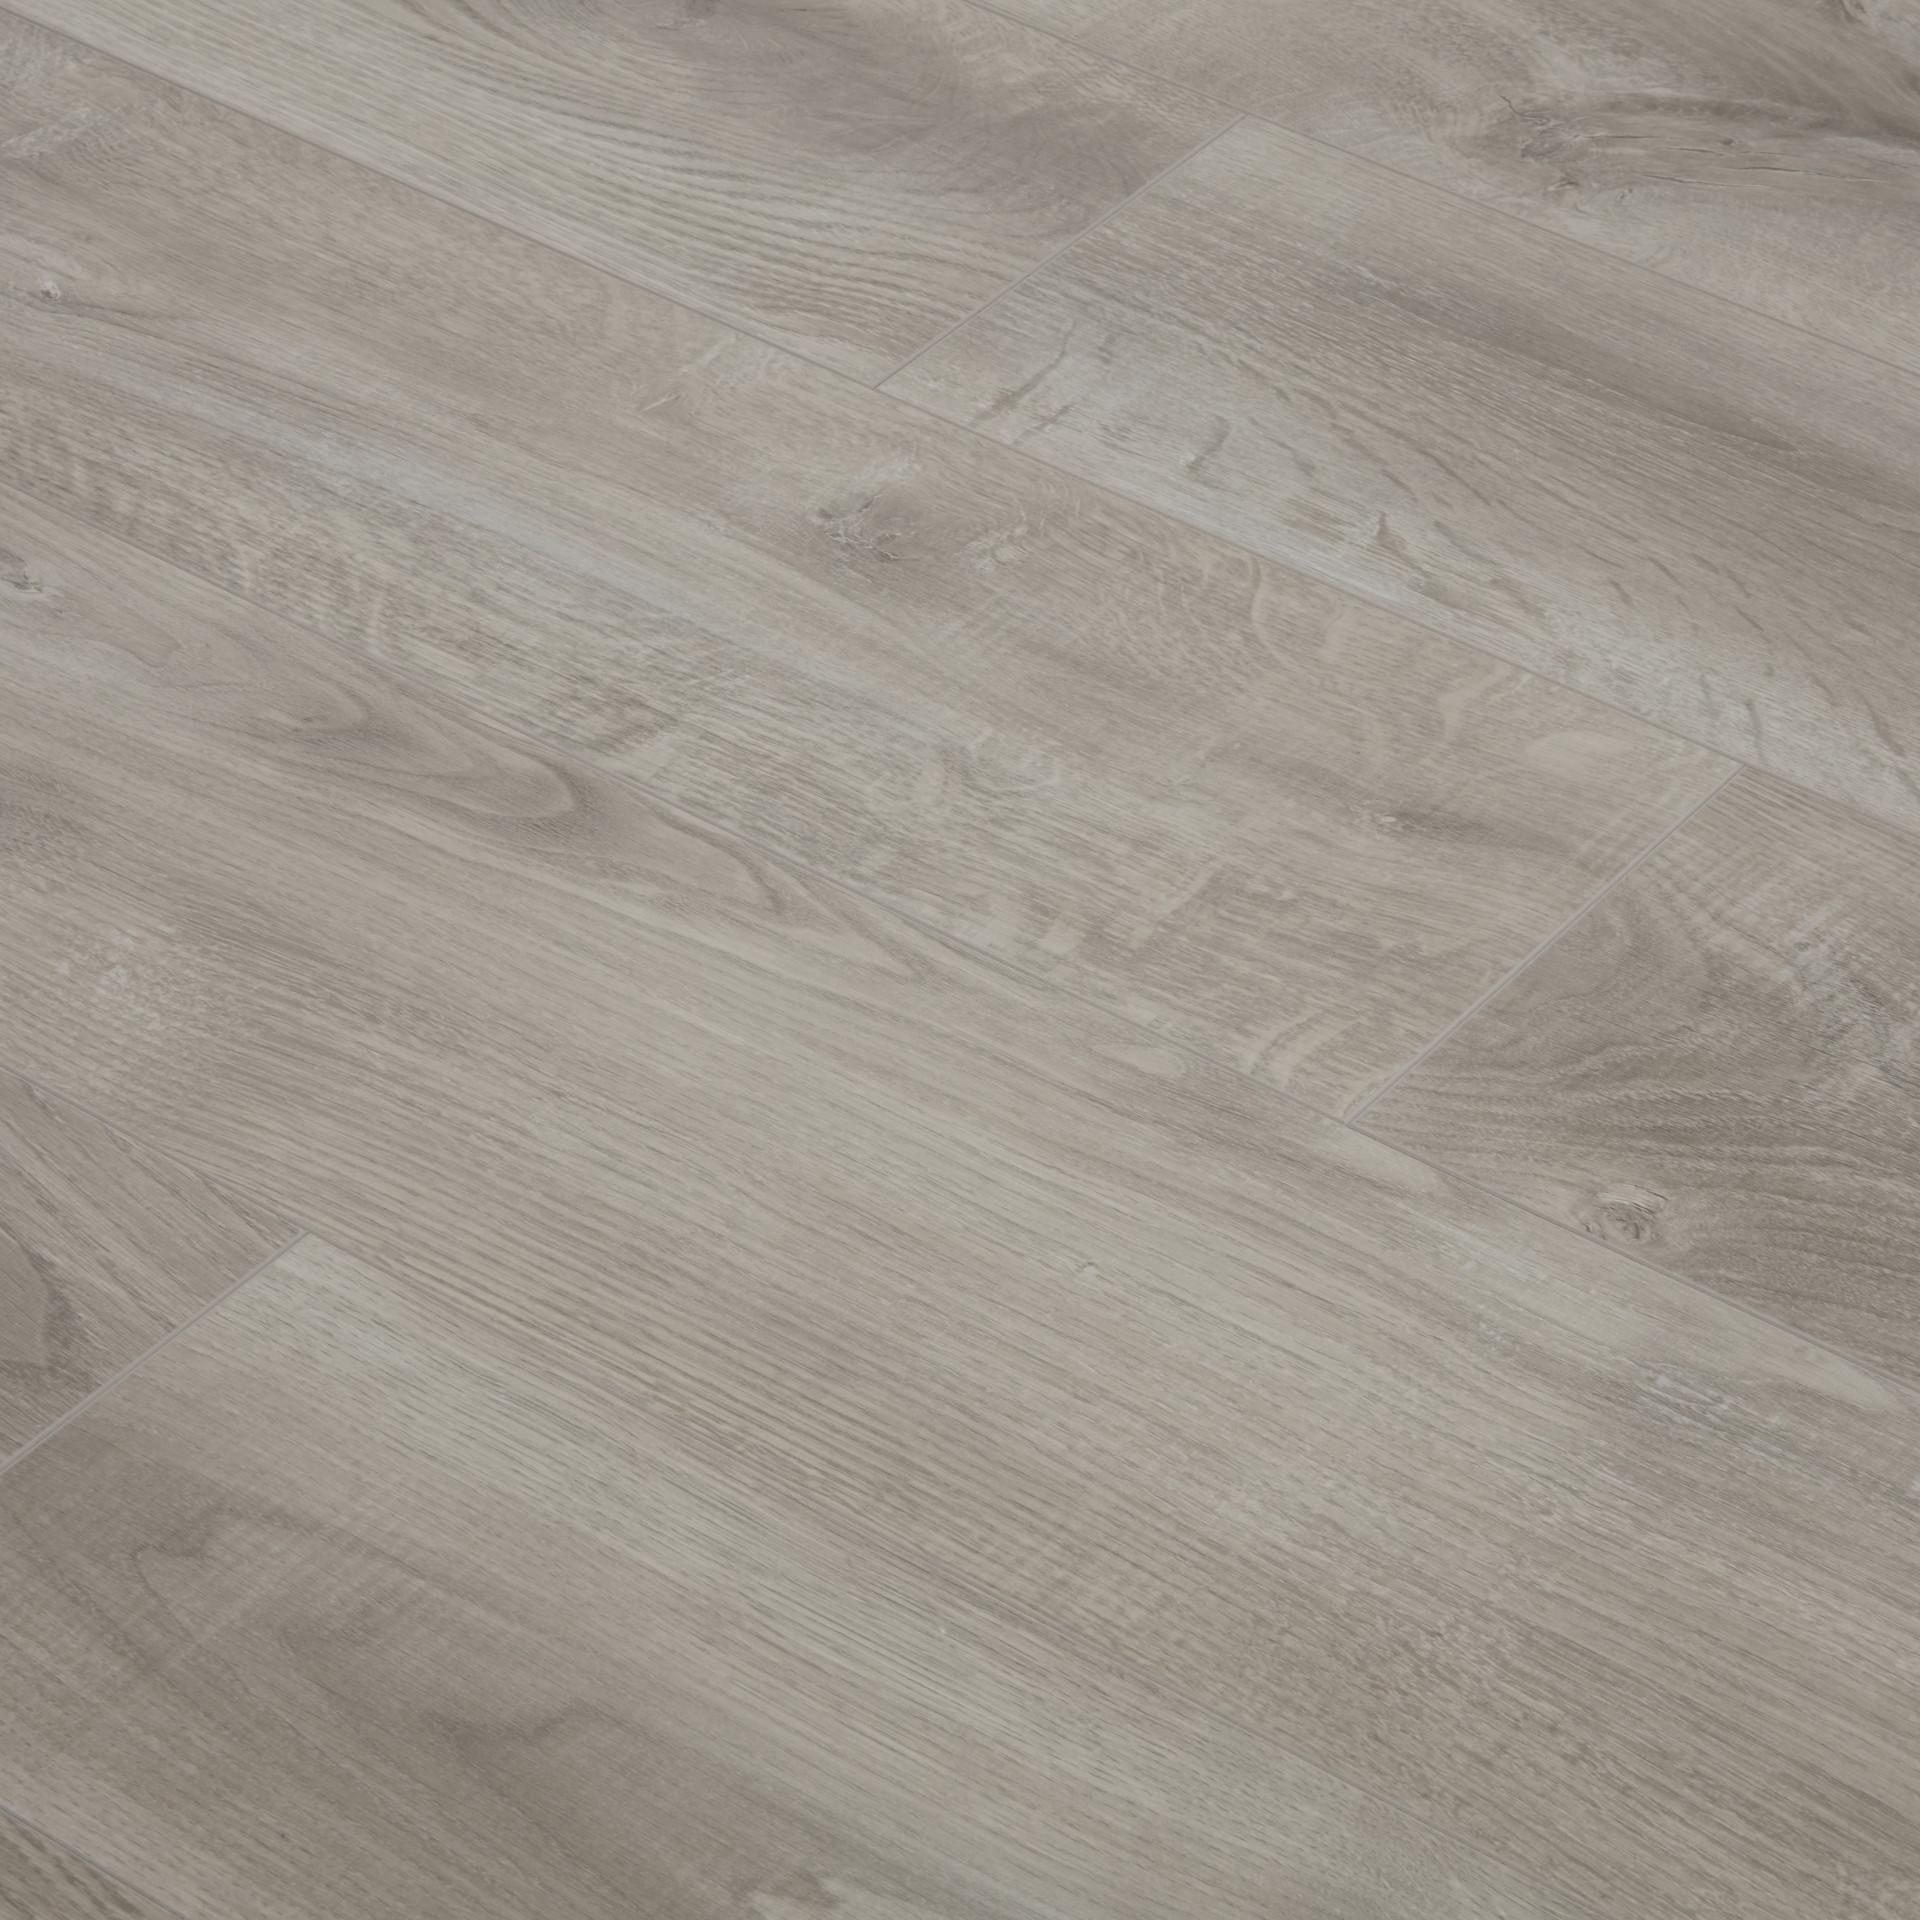 Kefe Weathered Oak Laminate Flooring, Weathered Oak Laminate Flooring